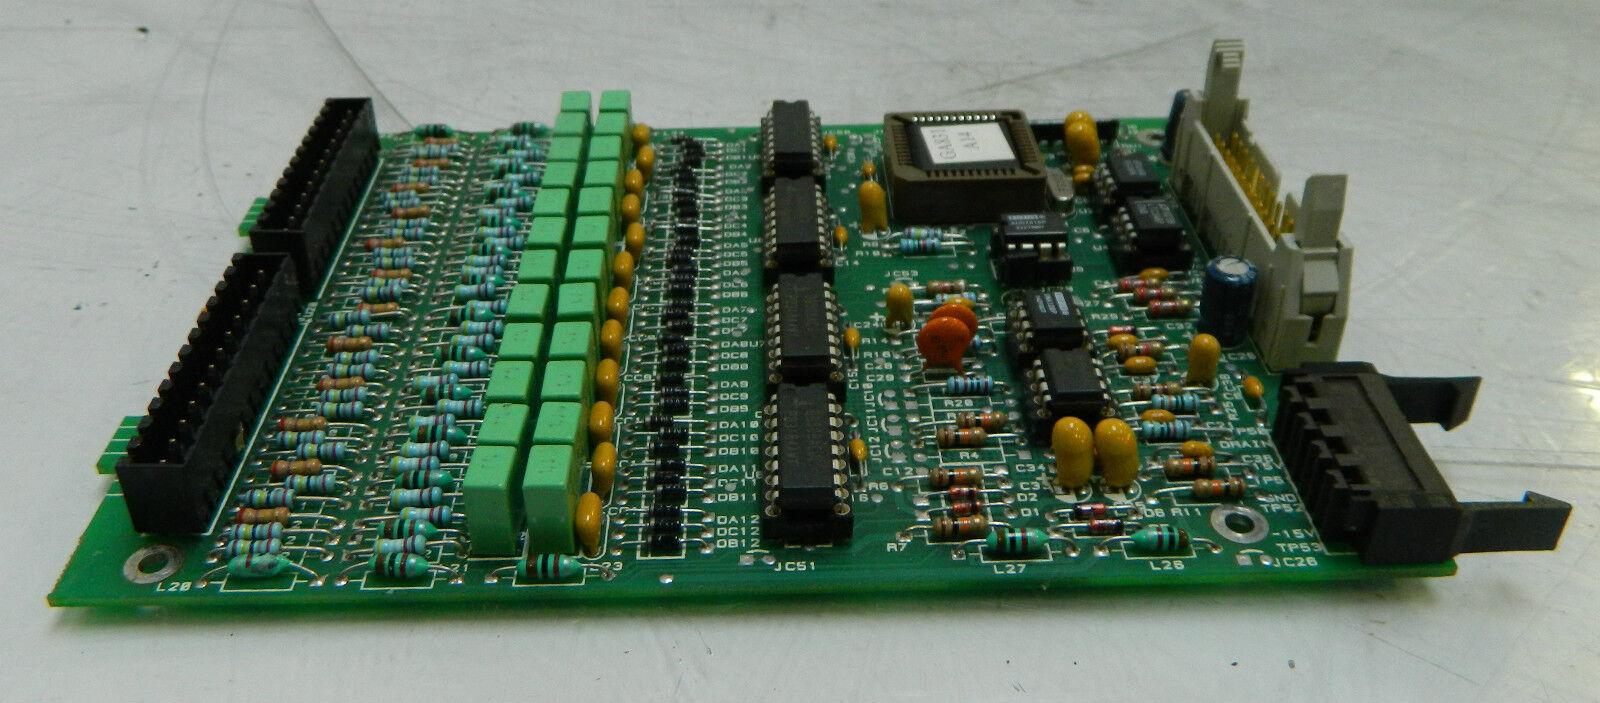 PC Assy Circuit Board, TM4615, GA-101-F02, Used, WARRANTY